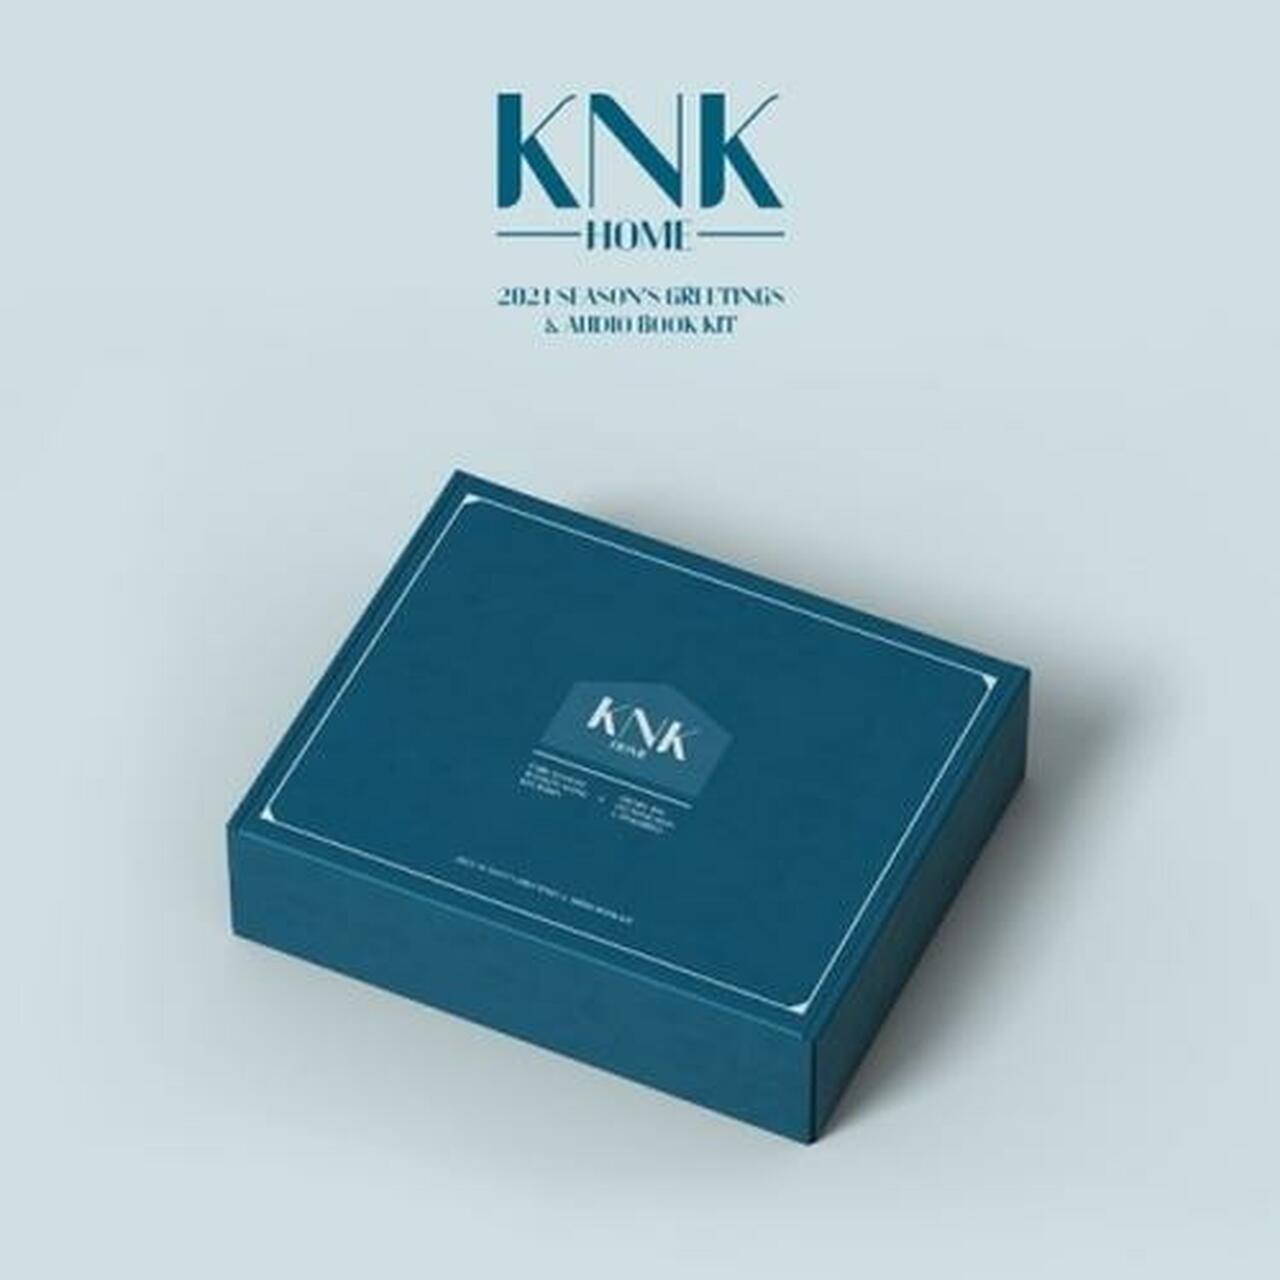 2021 SEASON'S GREETINGS & AUDIO BOOK KIT - KNK - Merchandise -  - 8809708832102 -